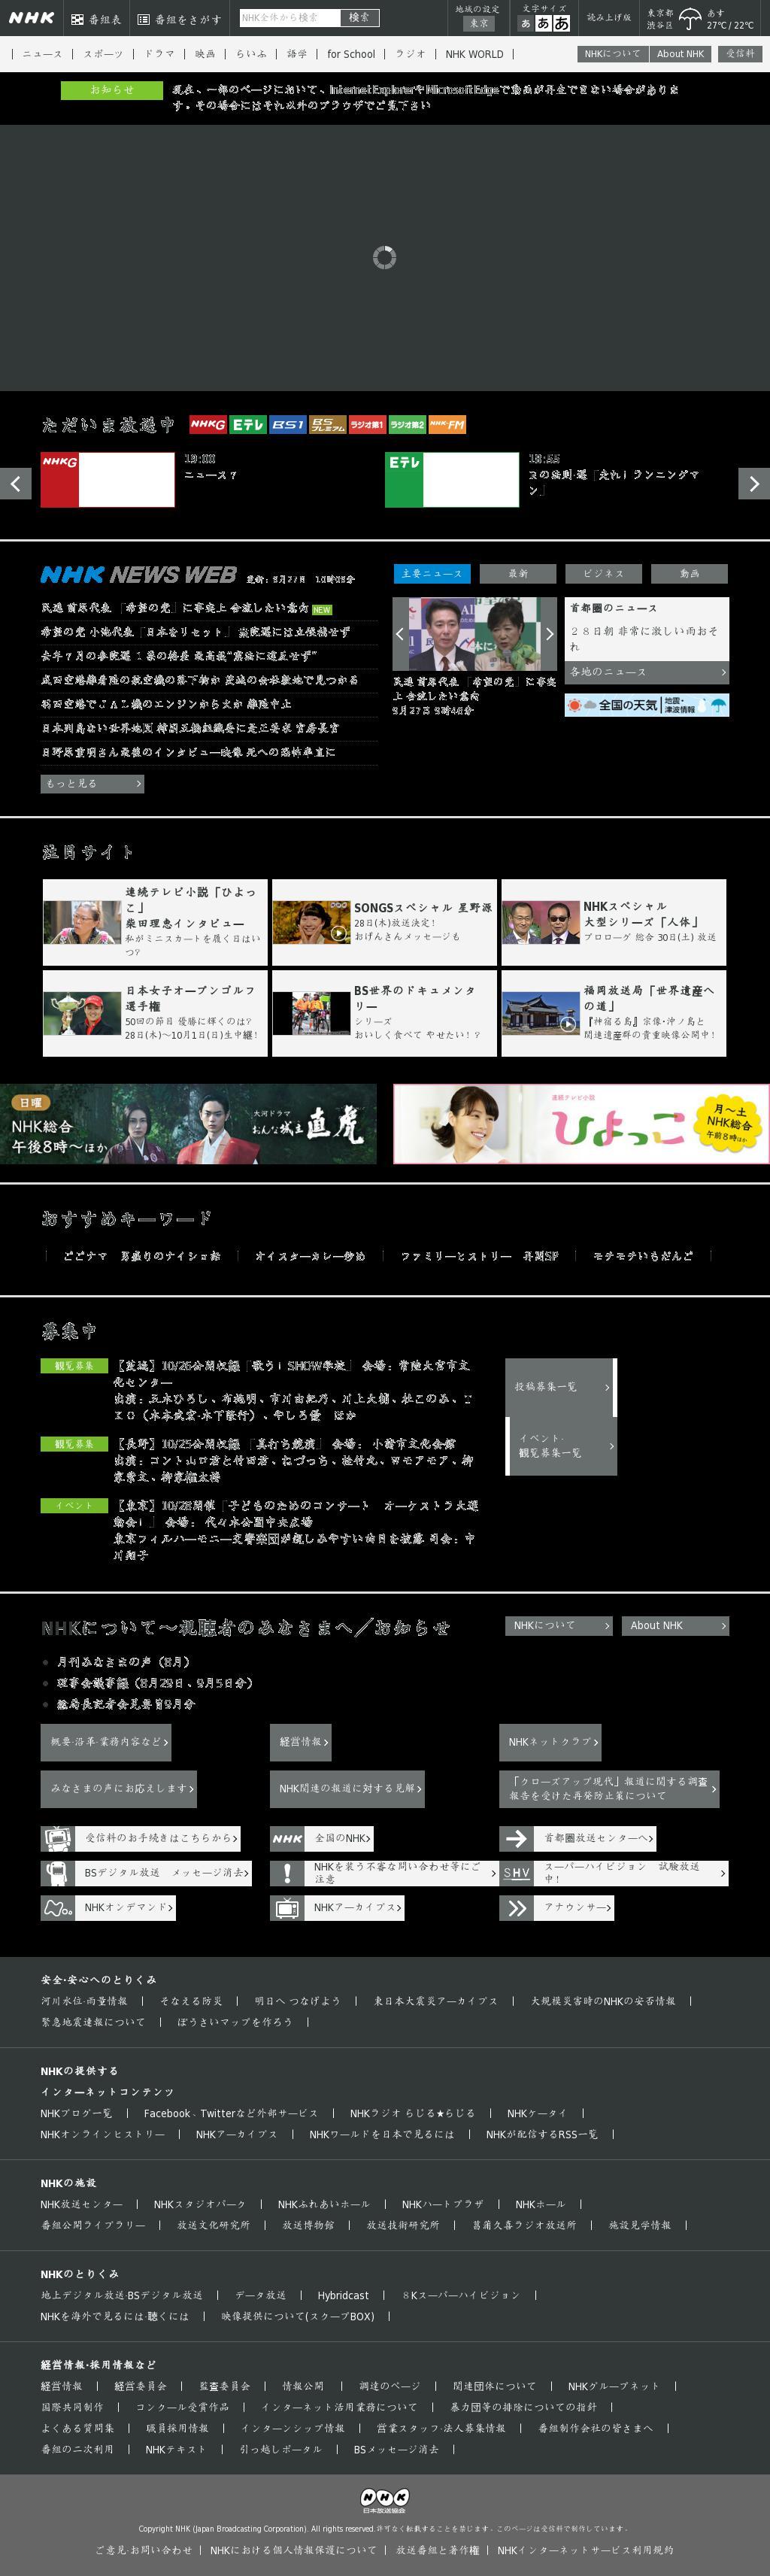 NHK Online at Wednesday Sept. 27, 2017, 10:15 a.m. UTC